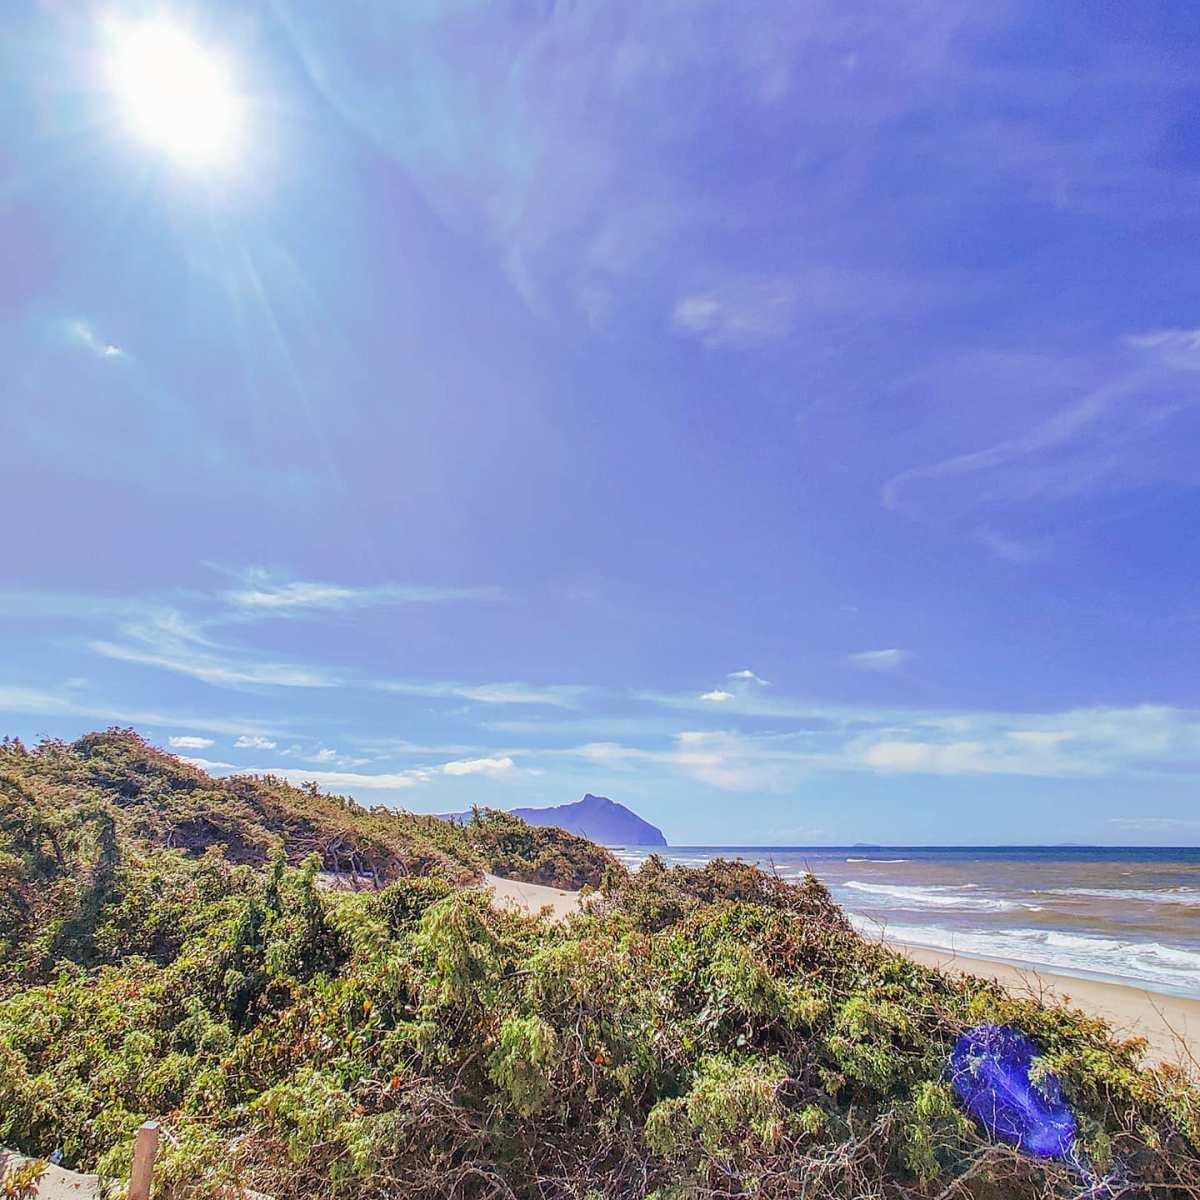 Sun therapy ️😎🤙#sabaudia #italy #Italia #mare #spiaggia #beachday #sunshine #traveling #sunset #travelphotography #travelblog #beachlife #travelgram #travelling #seascape #traveltheworld #sea #travel #traveller #beach #sunny #sun #seaside #sunnyday